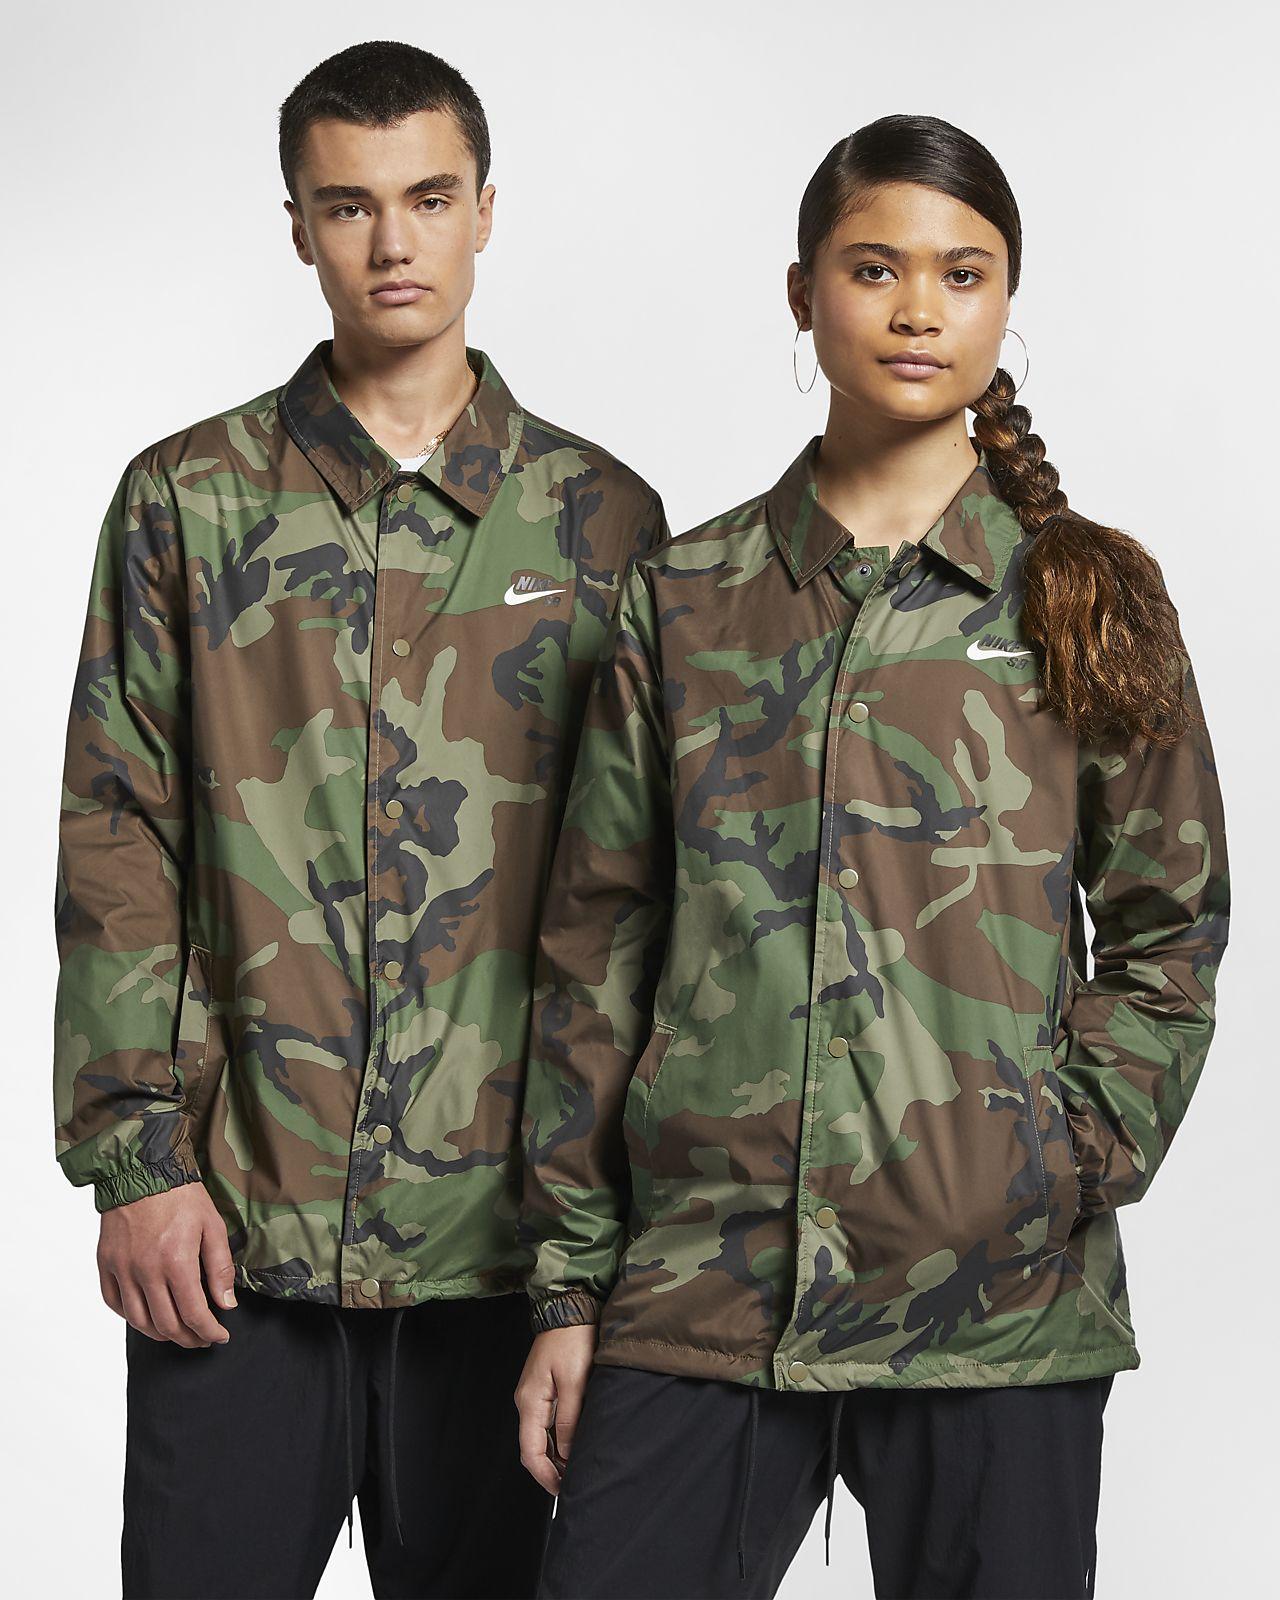 Veste de skateboard camouflage Nike SB